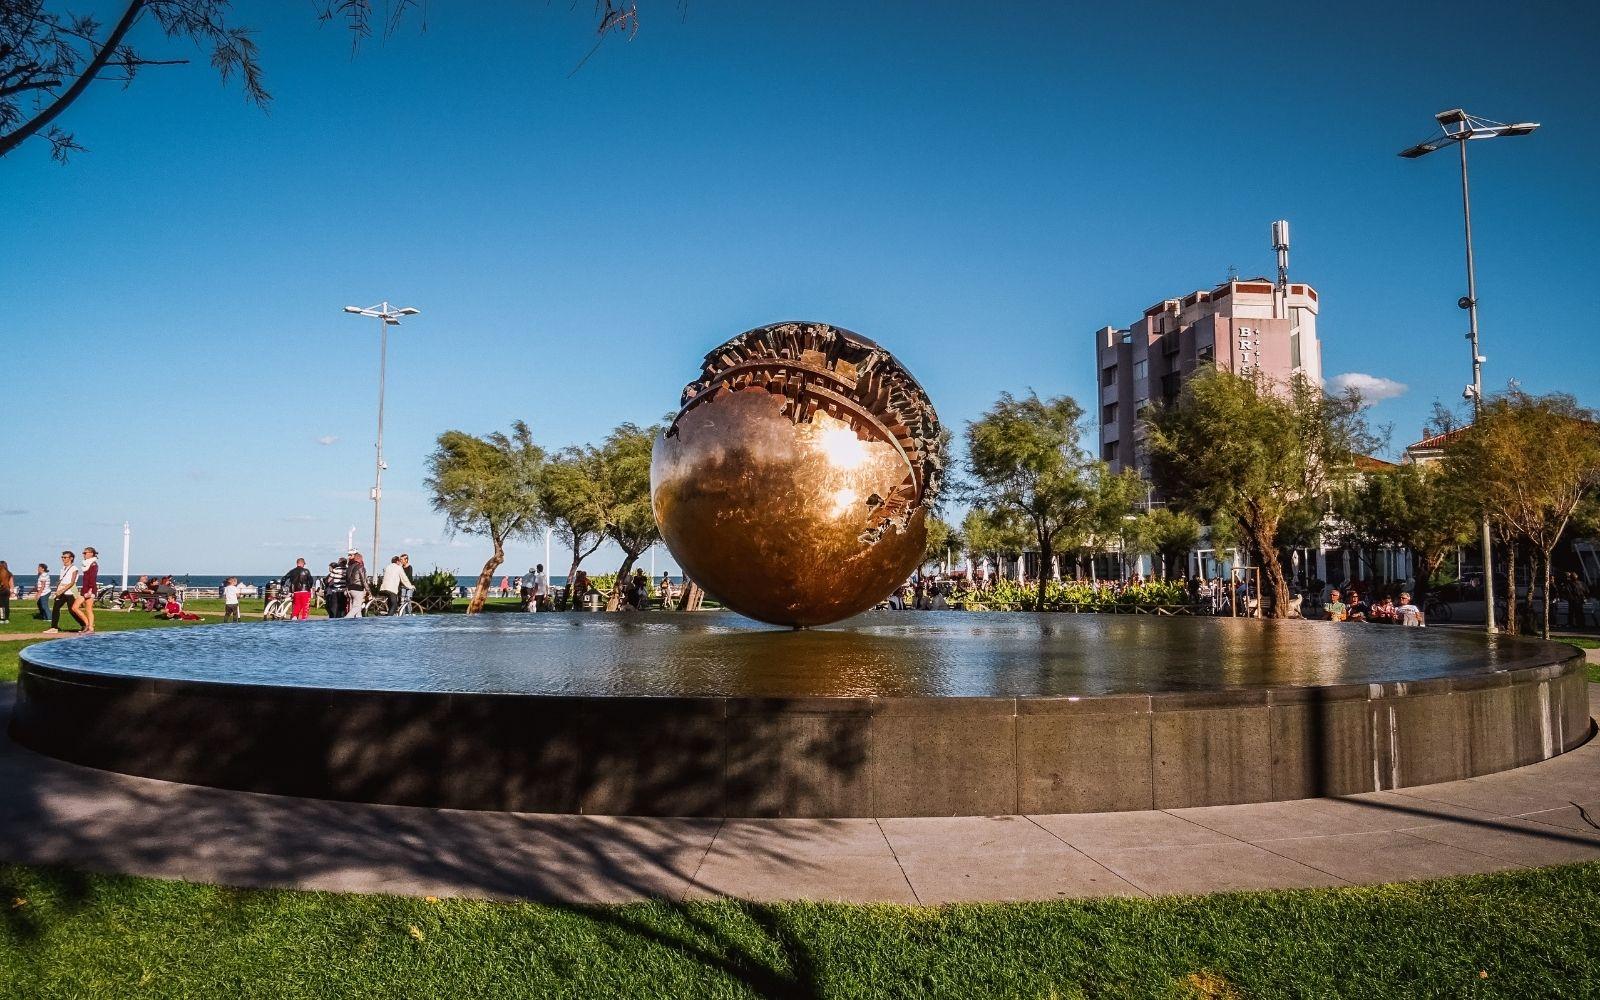 Pesaro e<br>dintorni